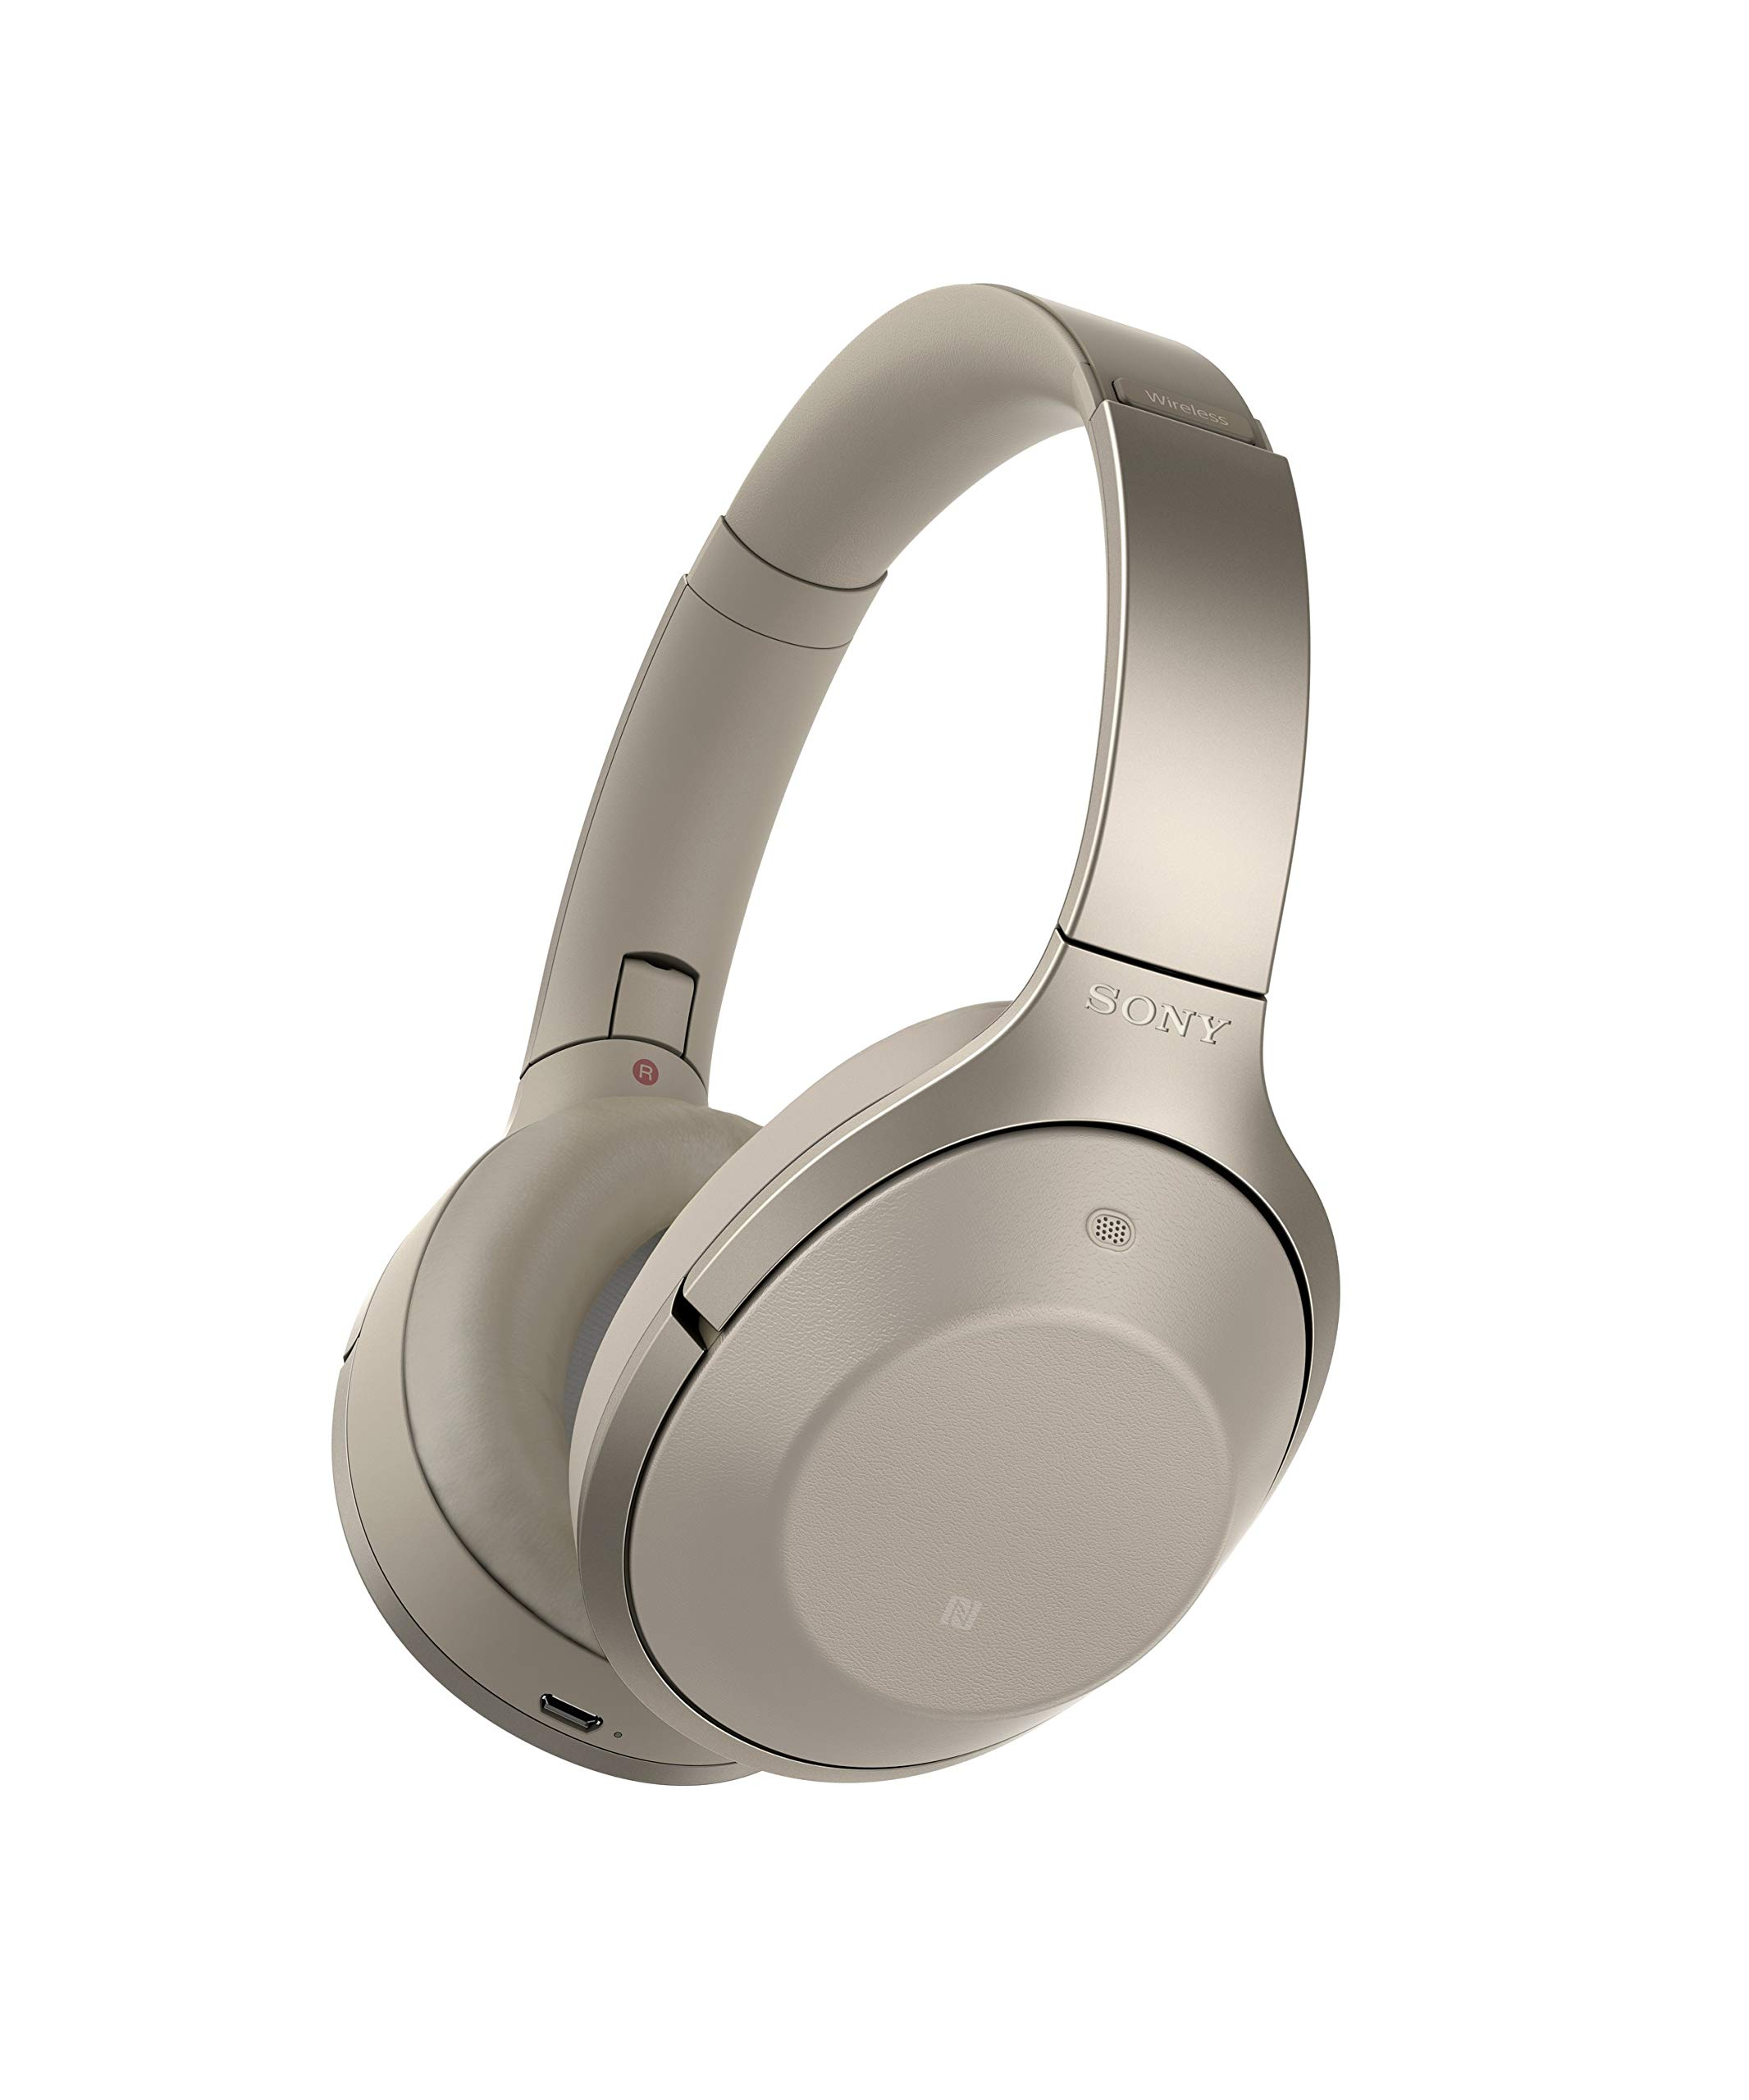 Amazon Com Sony Premium Noise Cancelling Bluetooth Headphone Grey Beige Mdr1000x C 2016 Model Electronics